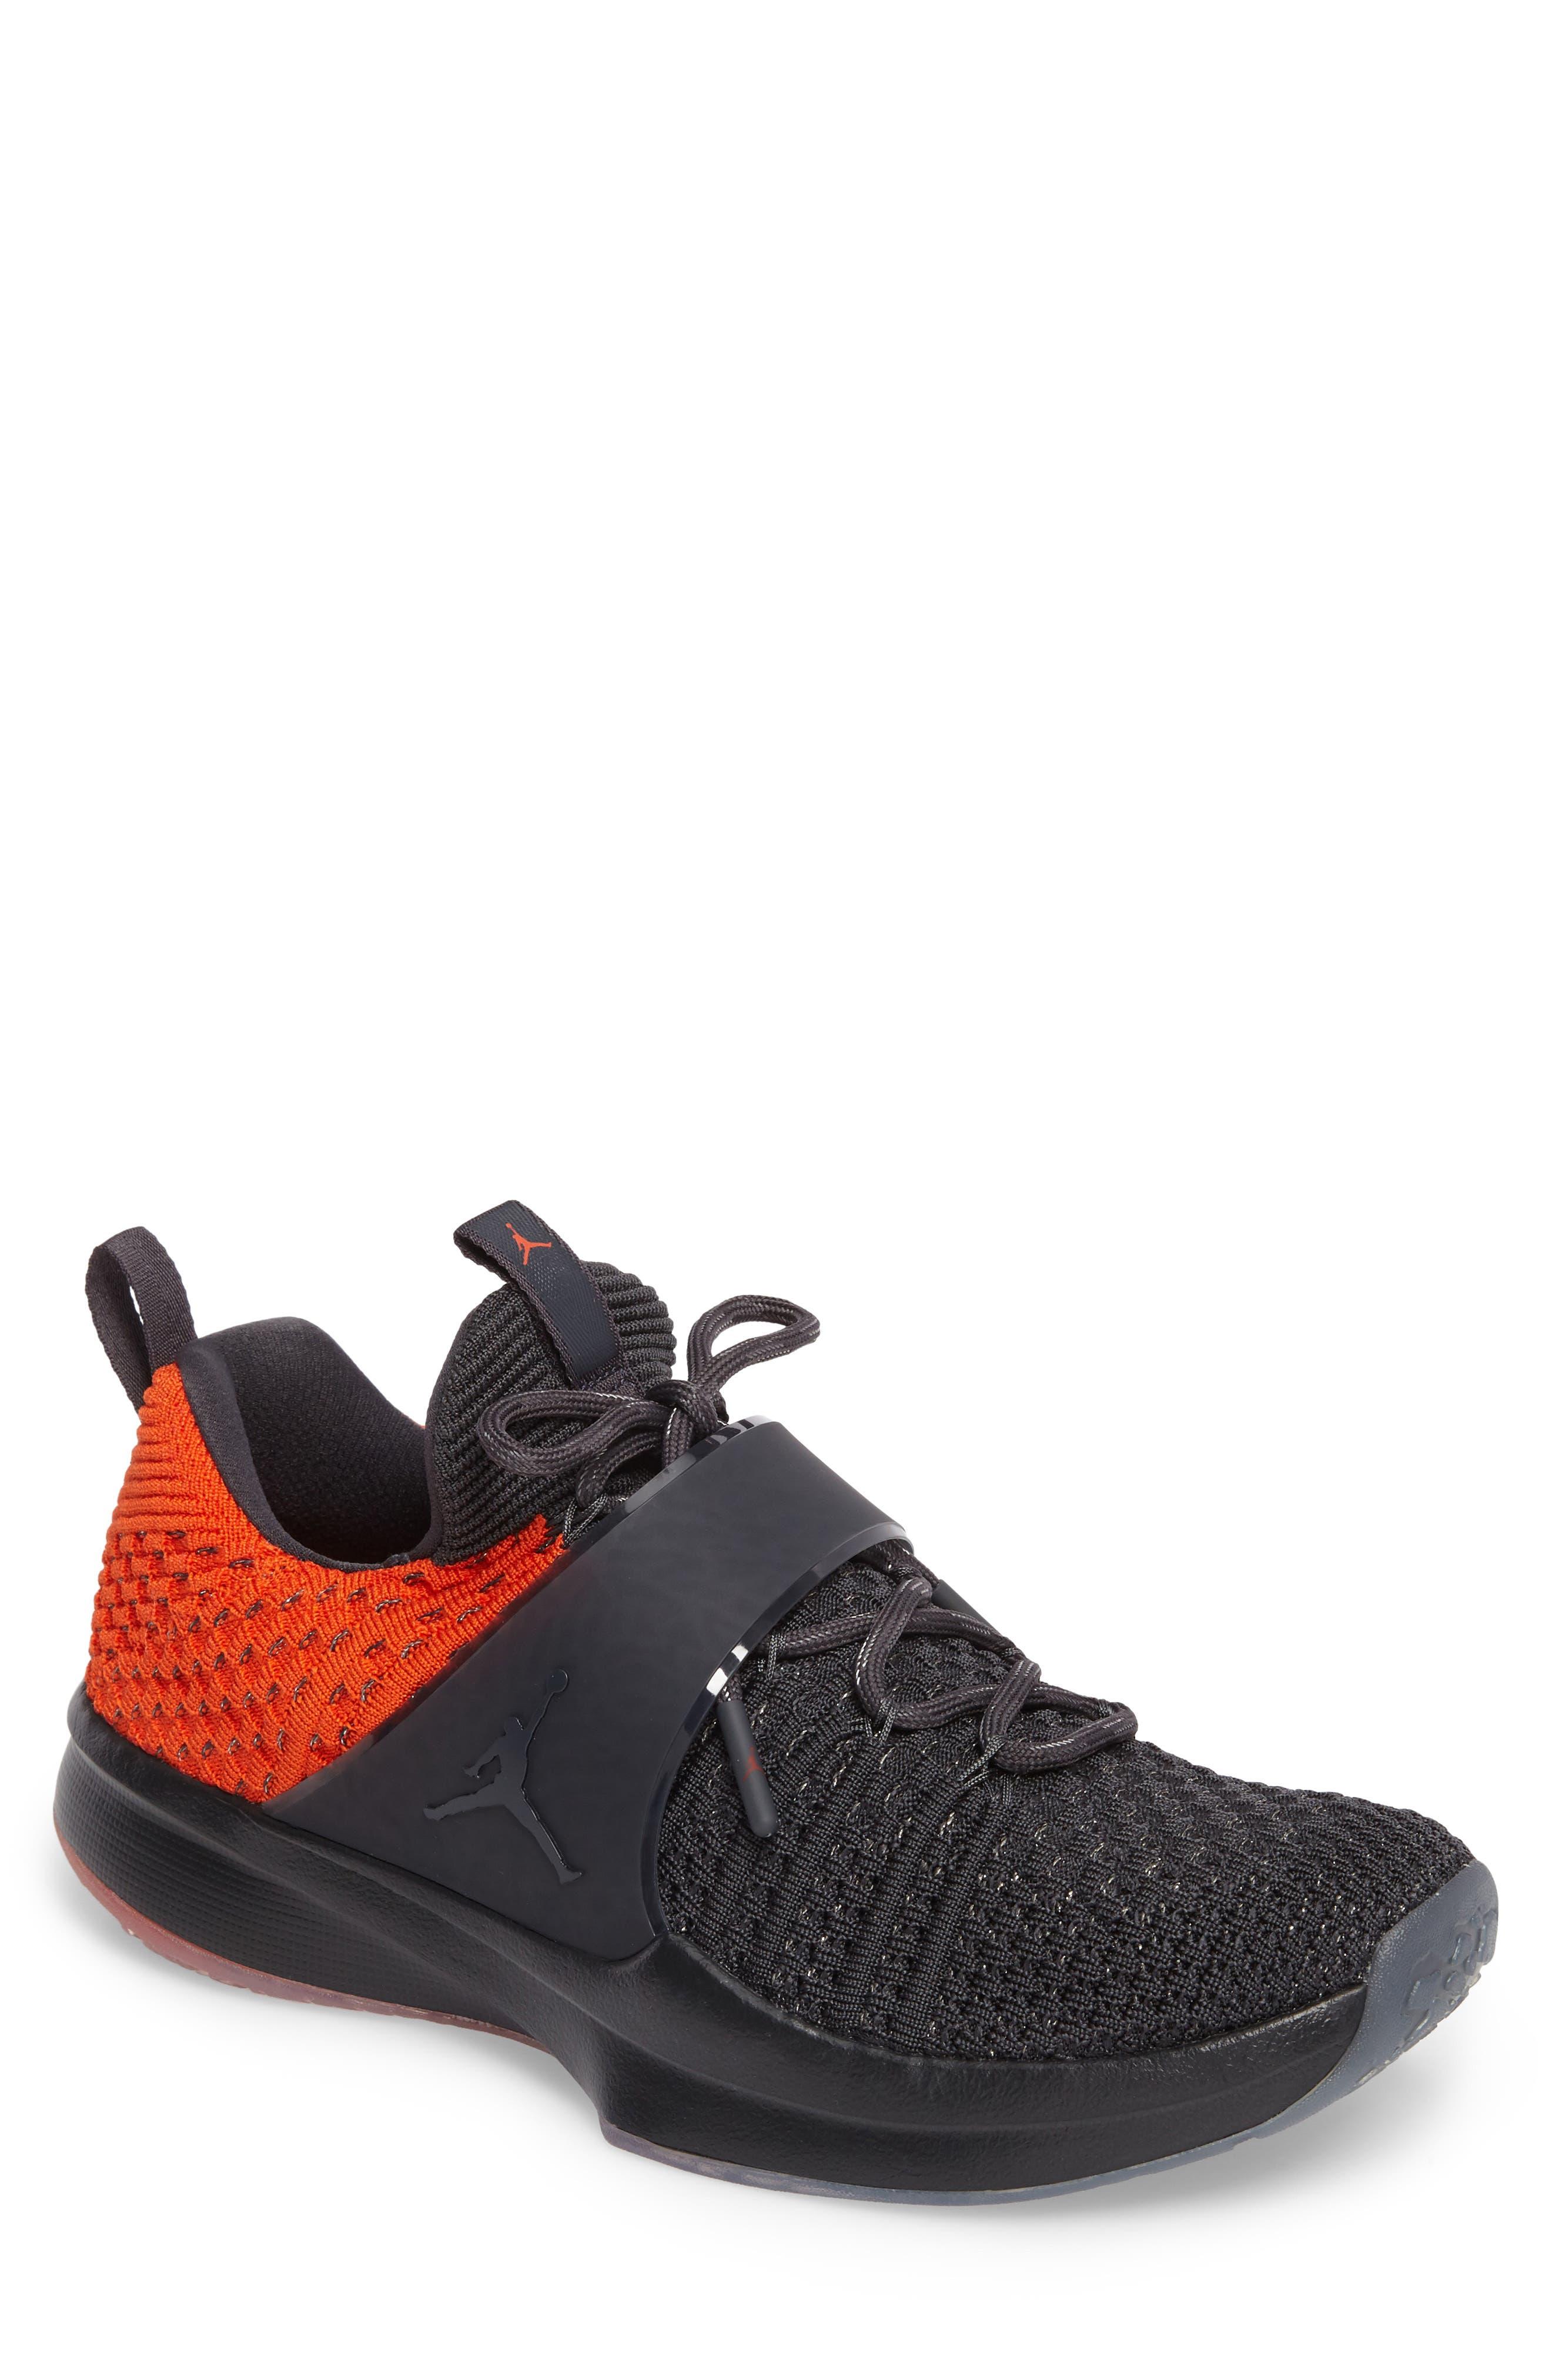 Jordan Flyknit Trainer 2 Low Sneaker,                             Main thumbnail 2, color,